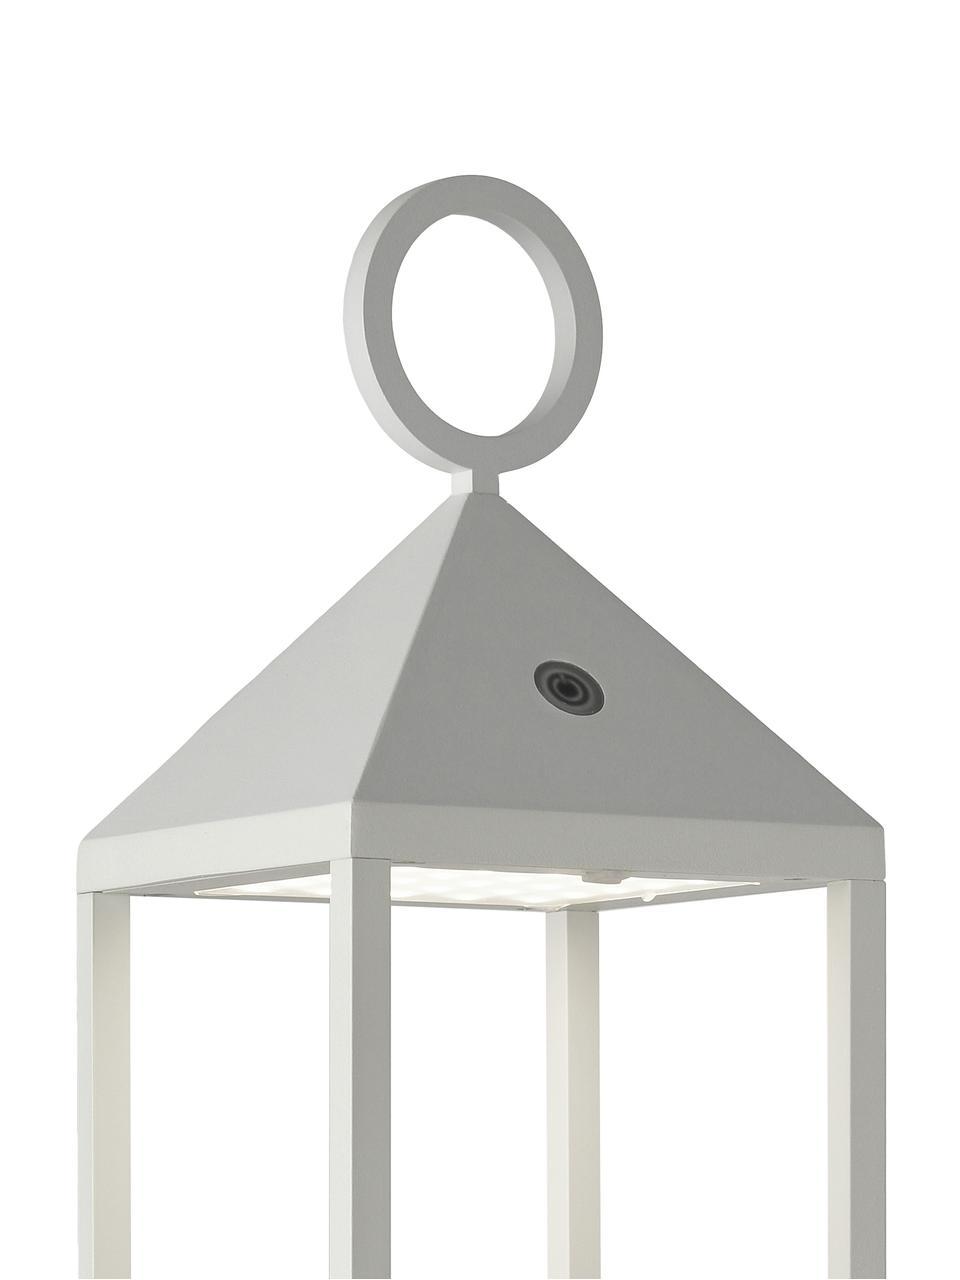 Mobile LED-Außenleuchte Cargo, Aluminium, lackiert, Weiß, 14 x 67 cm